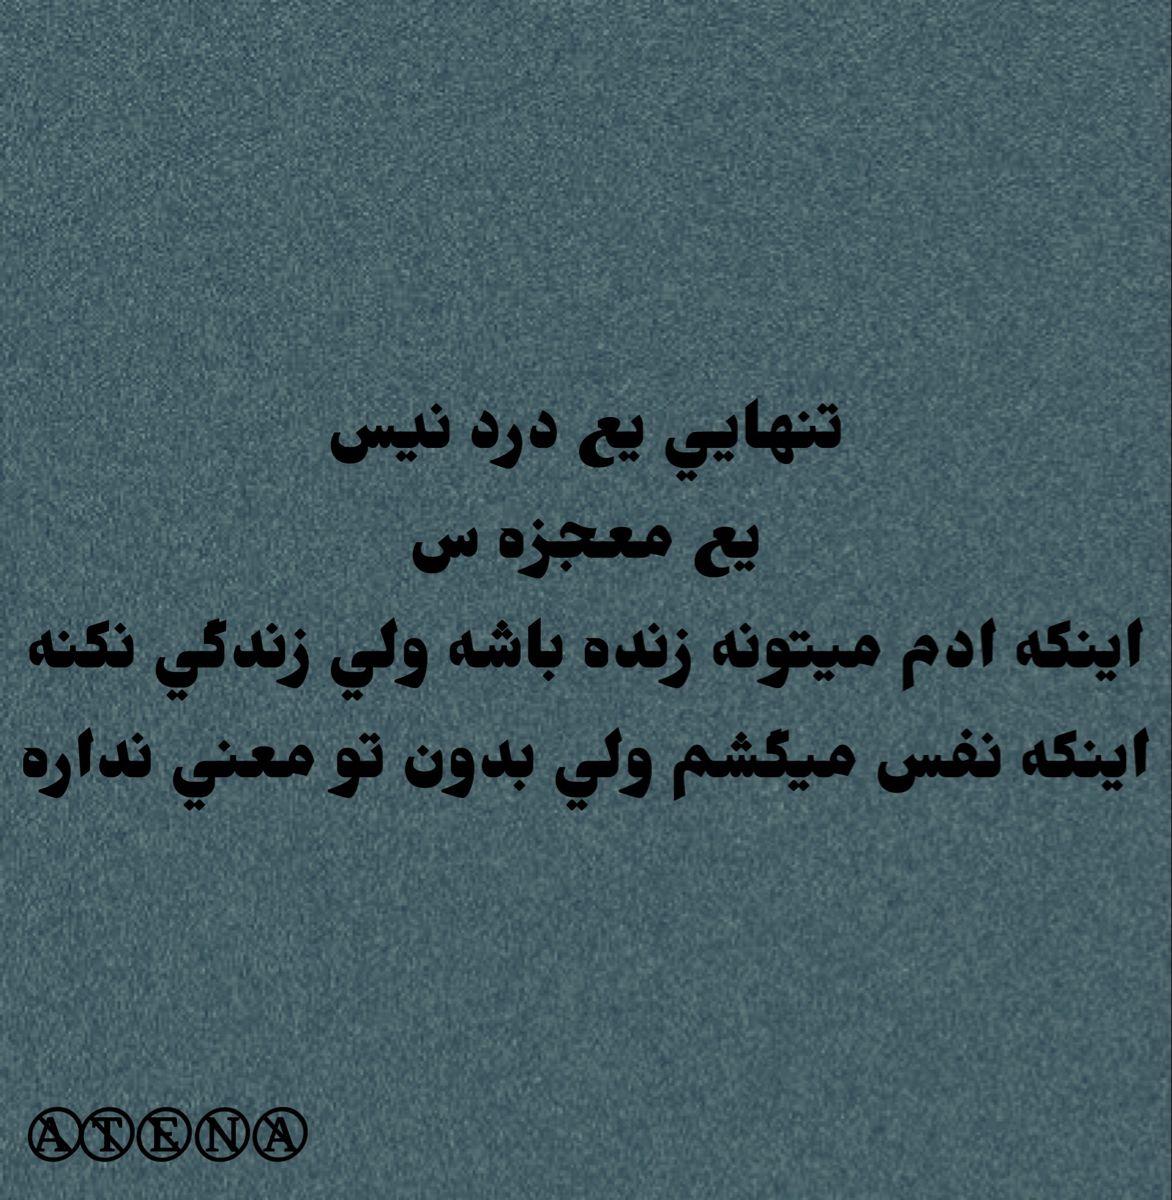 Vali To Khali Text Arabic Calligraphy Calligraphy